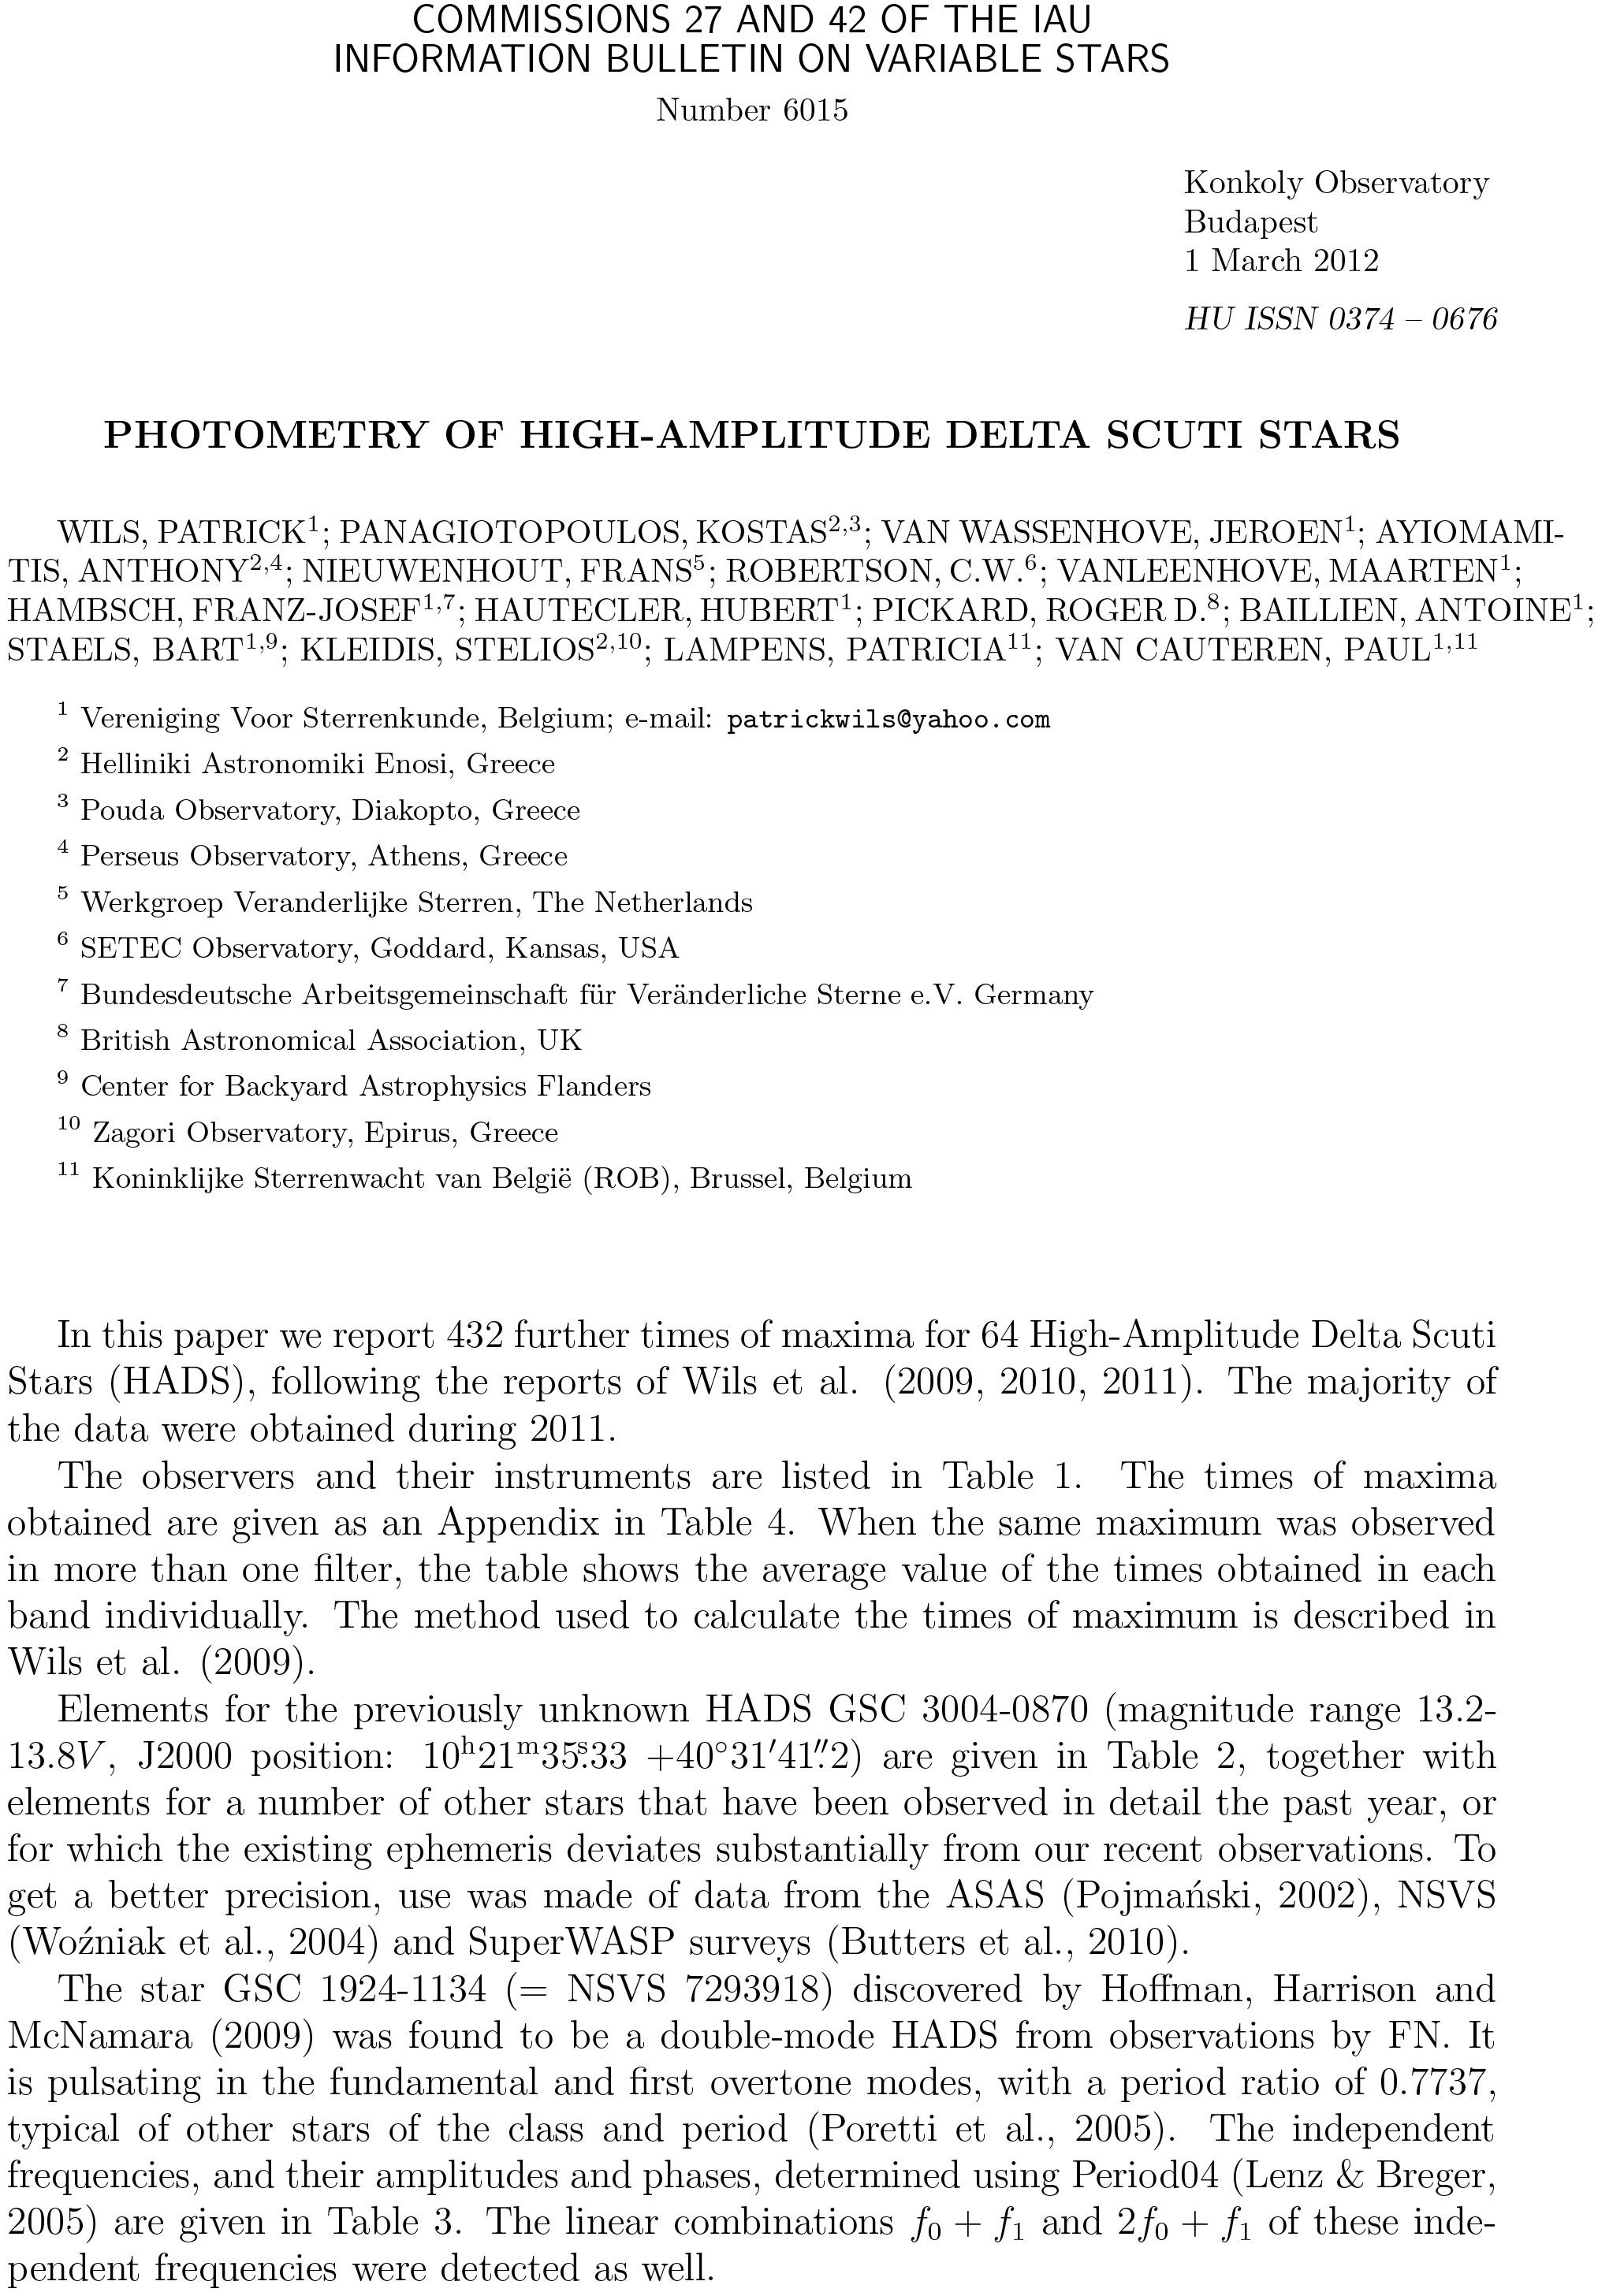 Photometry_of_High-Amplitude_Delta_Scuti